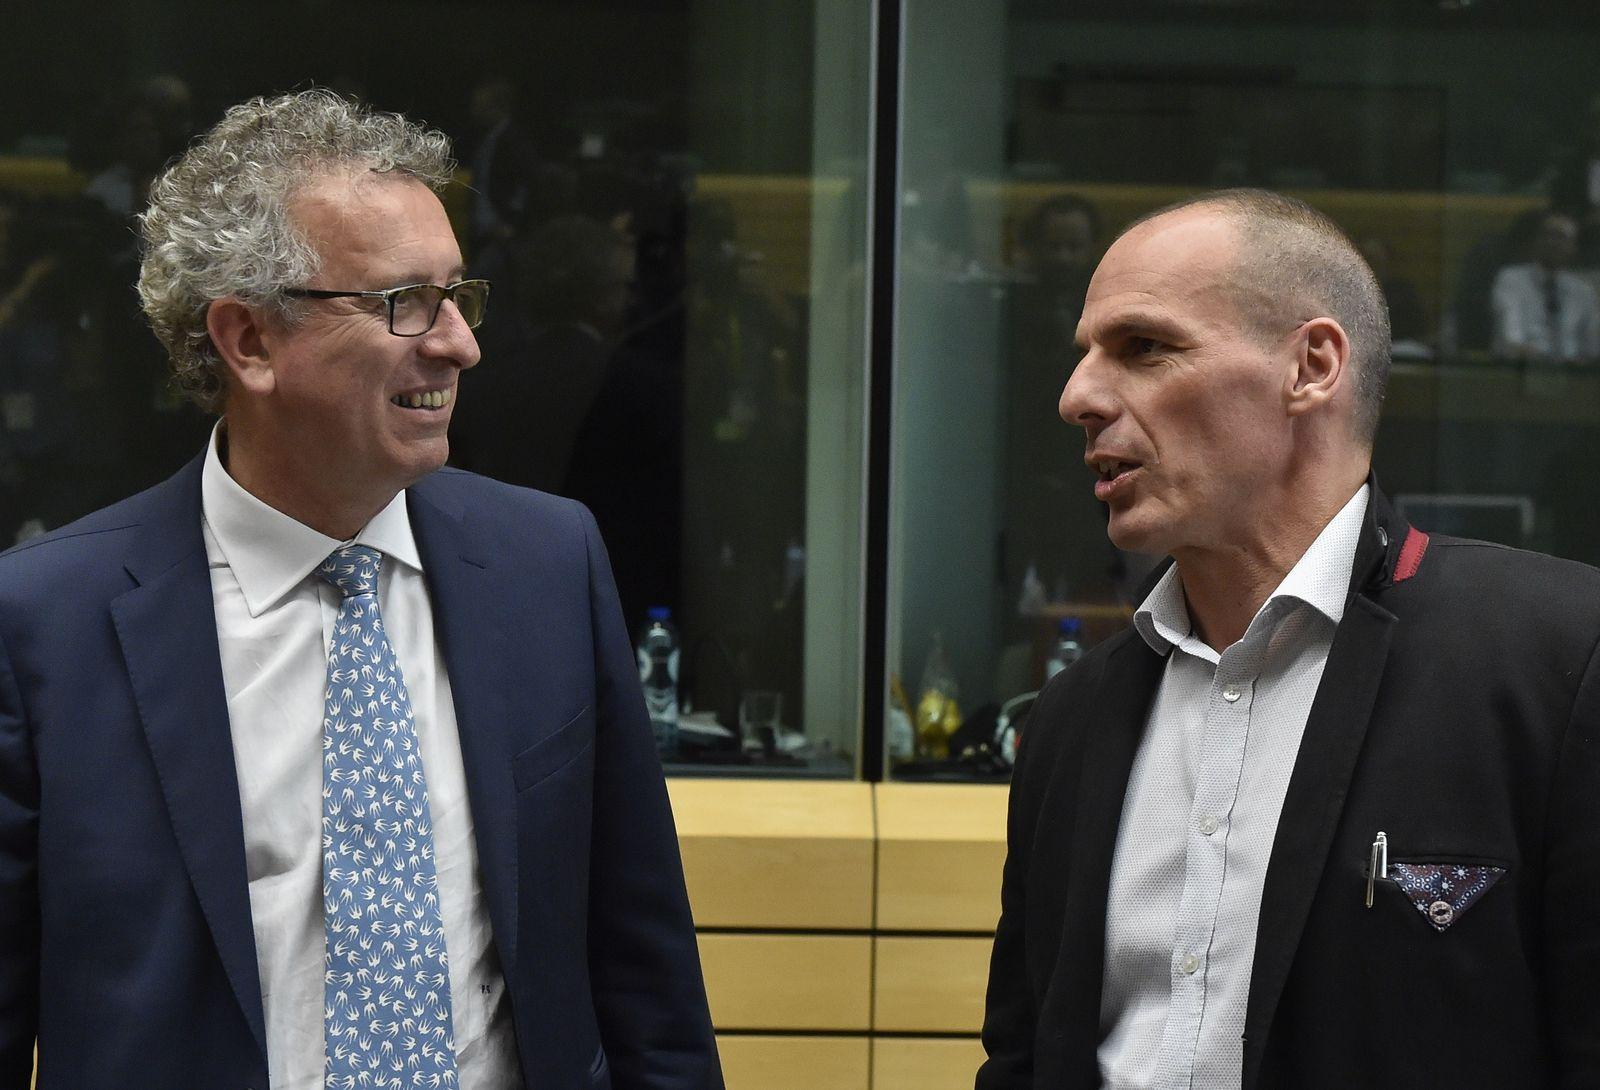 BELGIUM-EU-GREECE-EUROGROUP-FINANCE